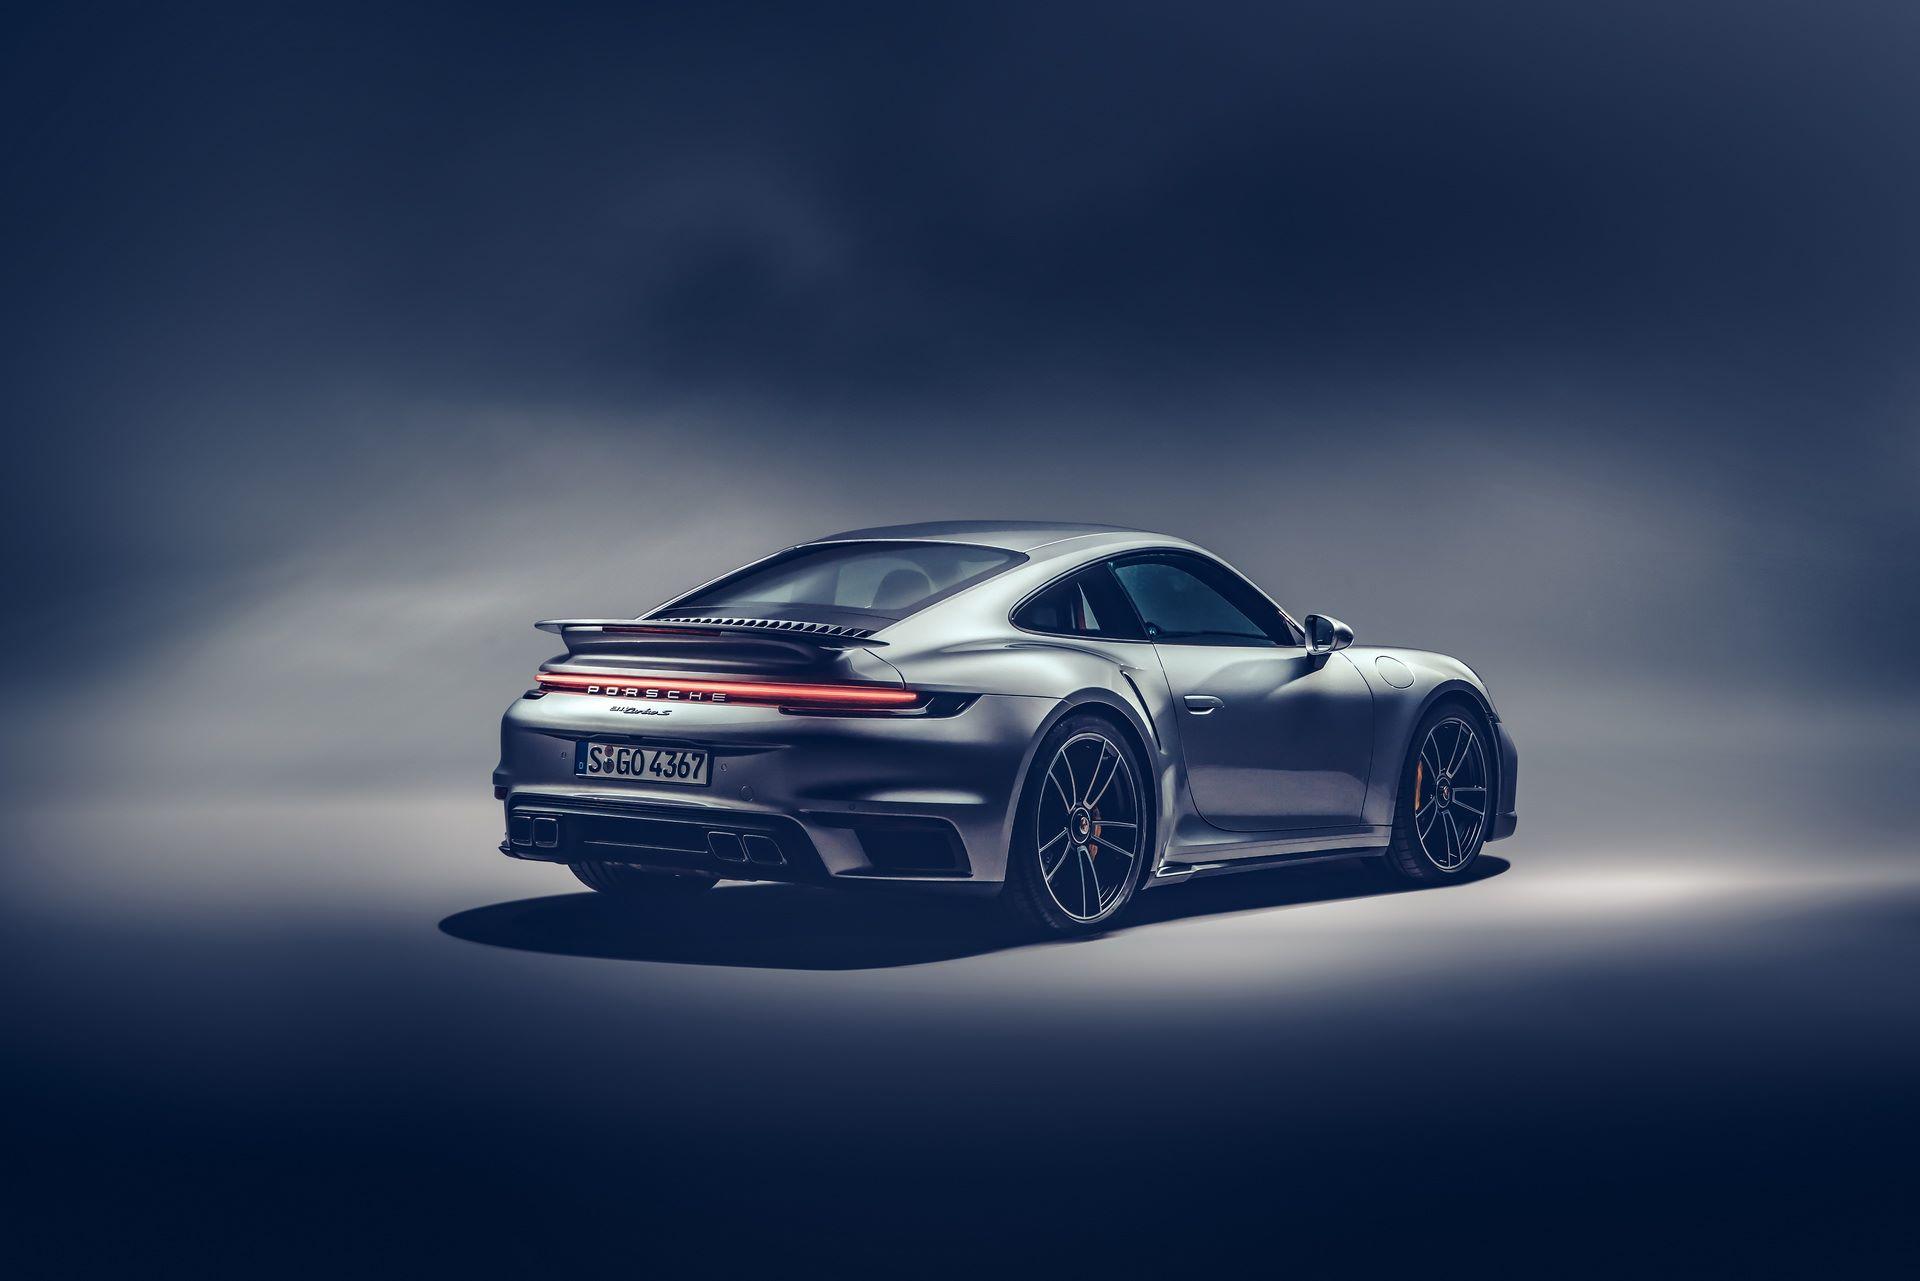 Porsche-911-Turbo-S-2020-9